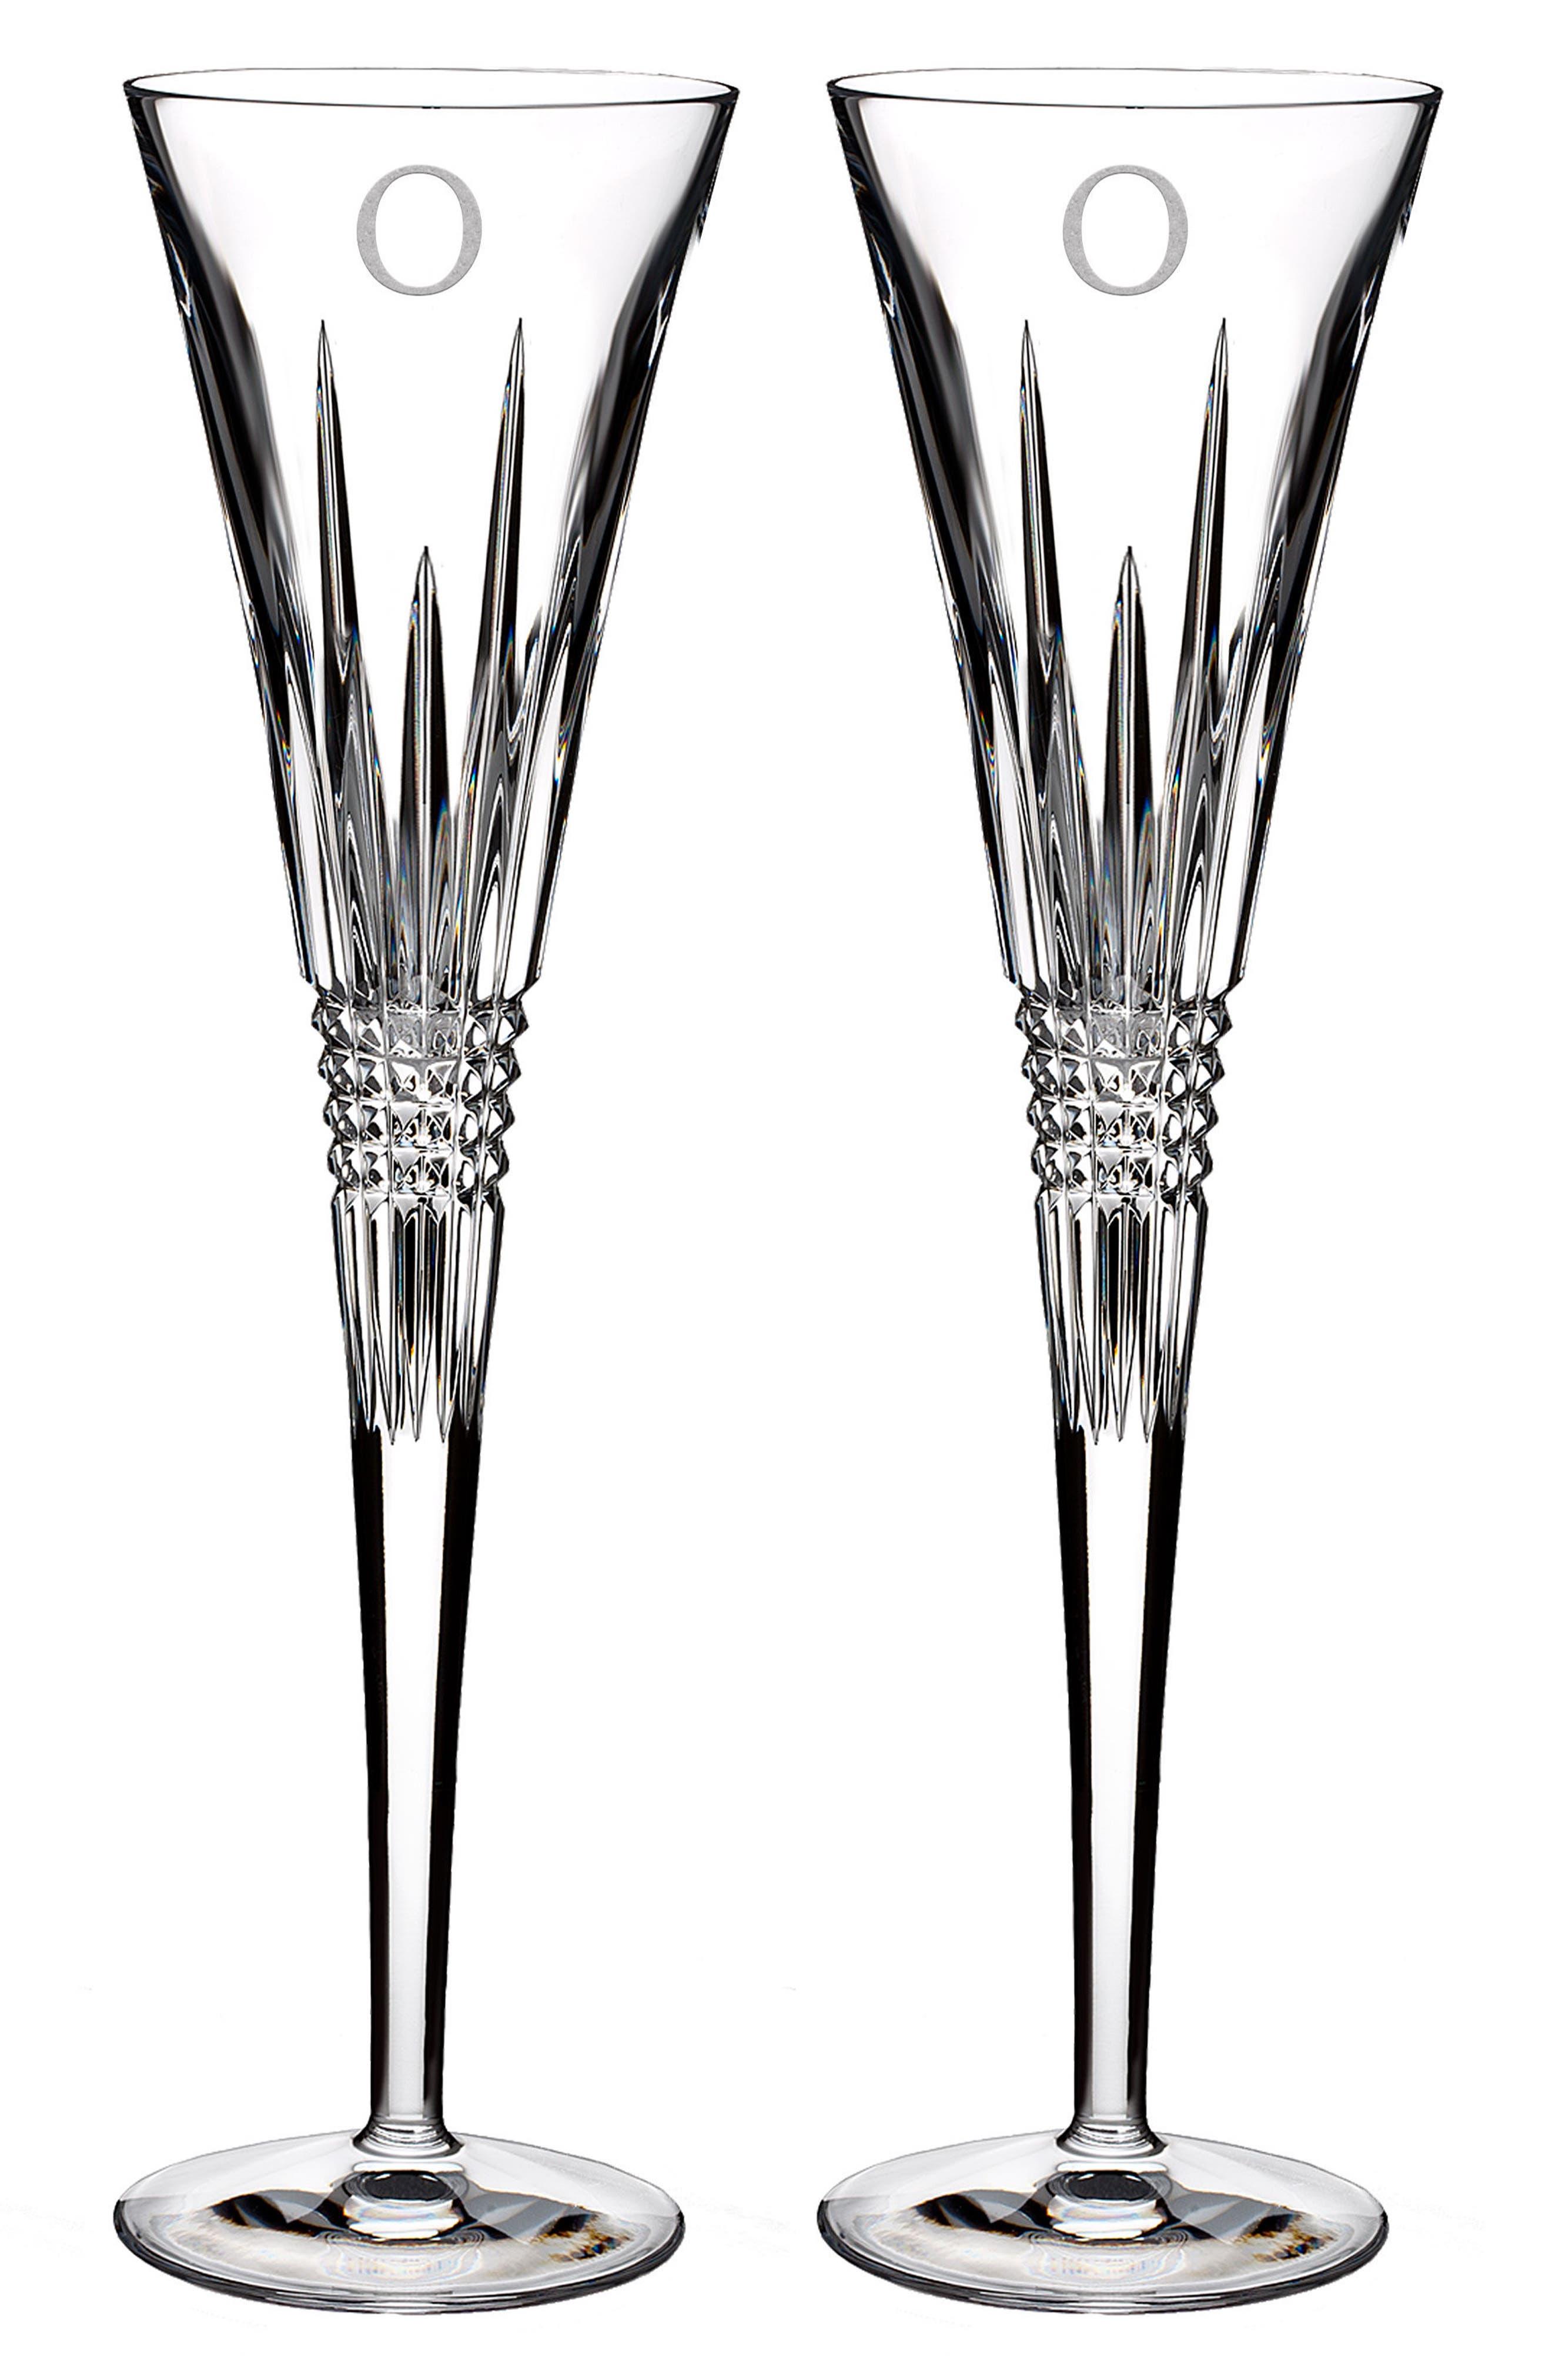 Lismore Diamond Set of 2 Monogram Lead Crystal Champagne Flutes,                         Main,                         color, Clear - O